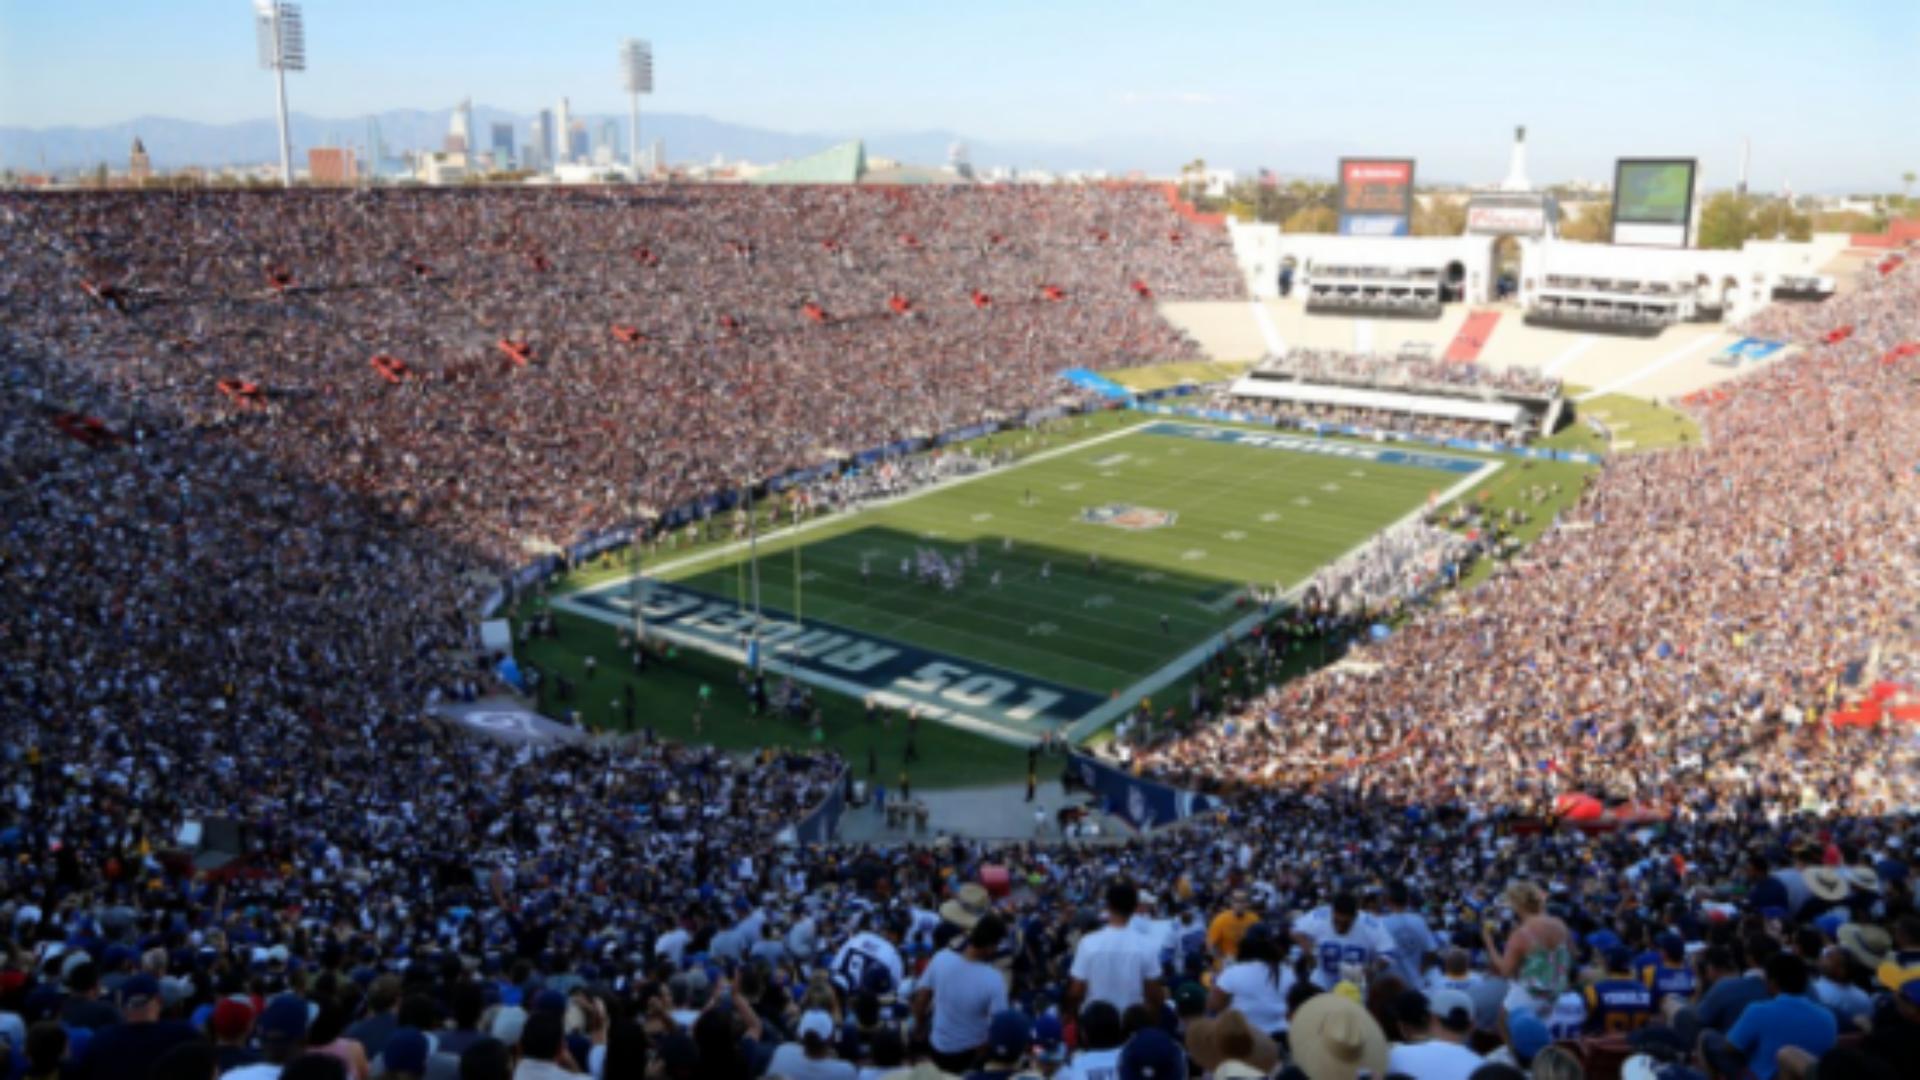 Rams Stadium Hd Wallpaper - La Rams Los Angeles Coliseum , HD Wallpaper & Backgrounds